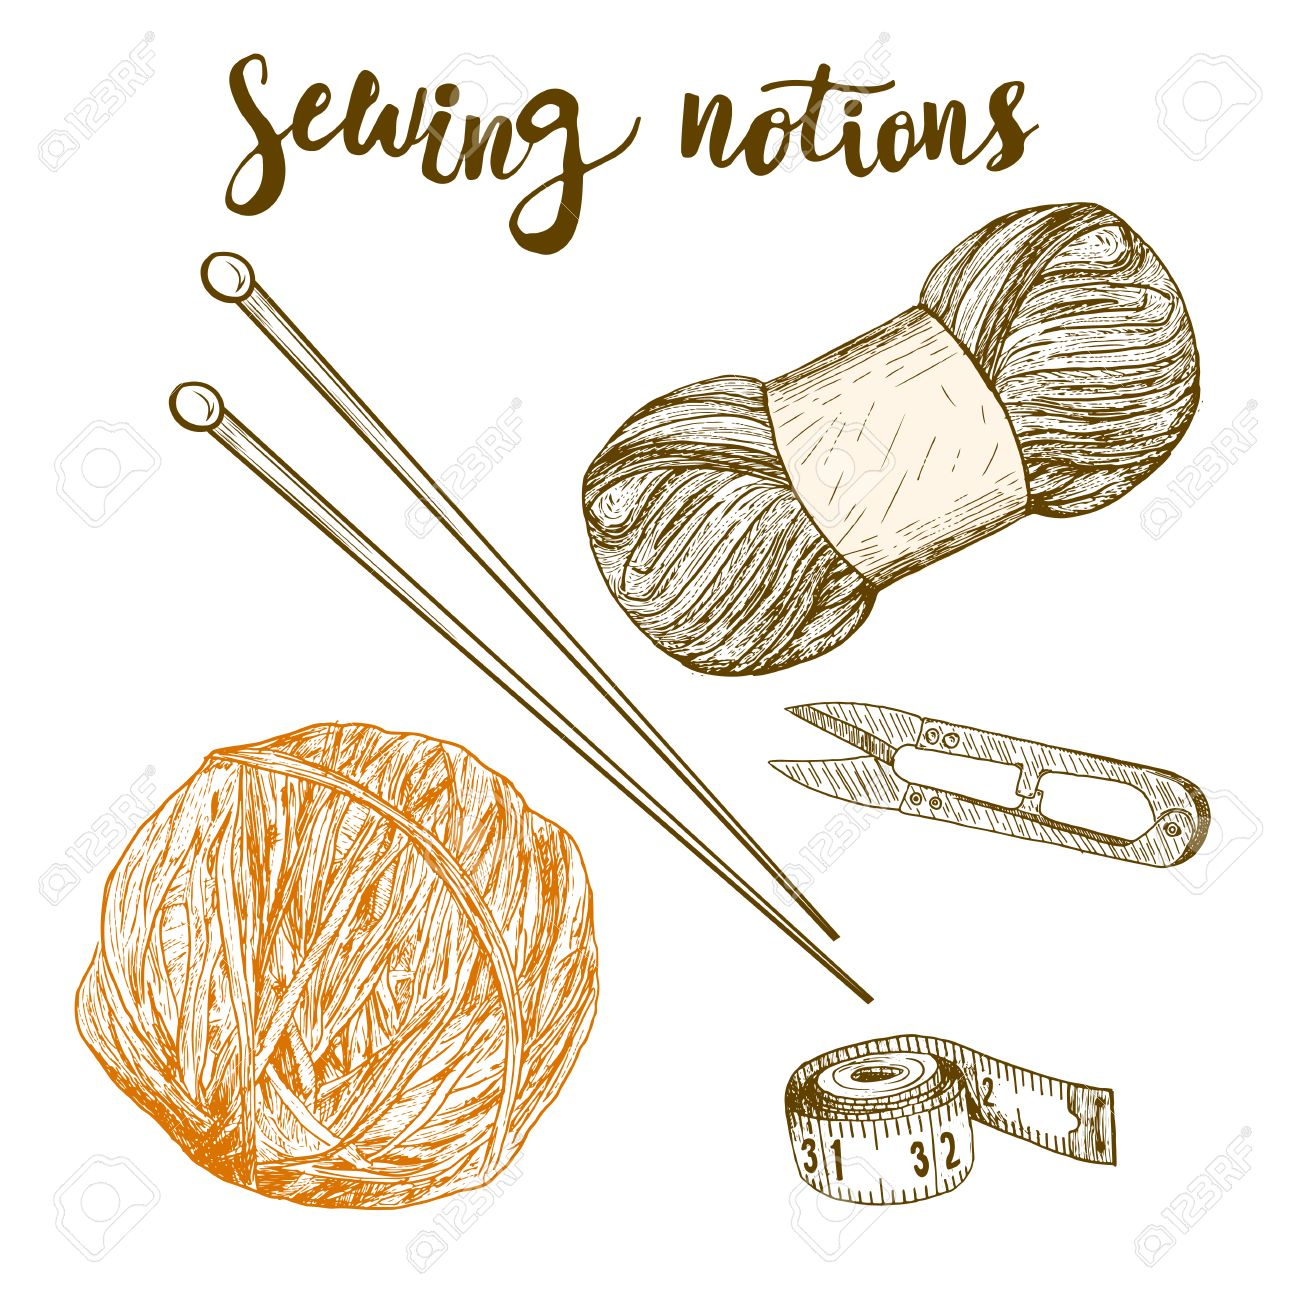 1300x1300 Sewing Notions. Hand Drawn Thread, Needle, Scissors, Ball